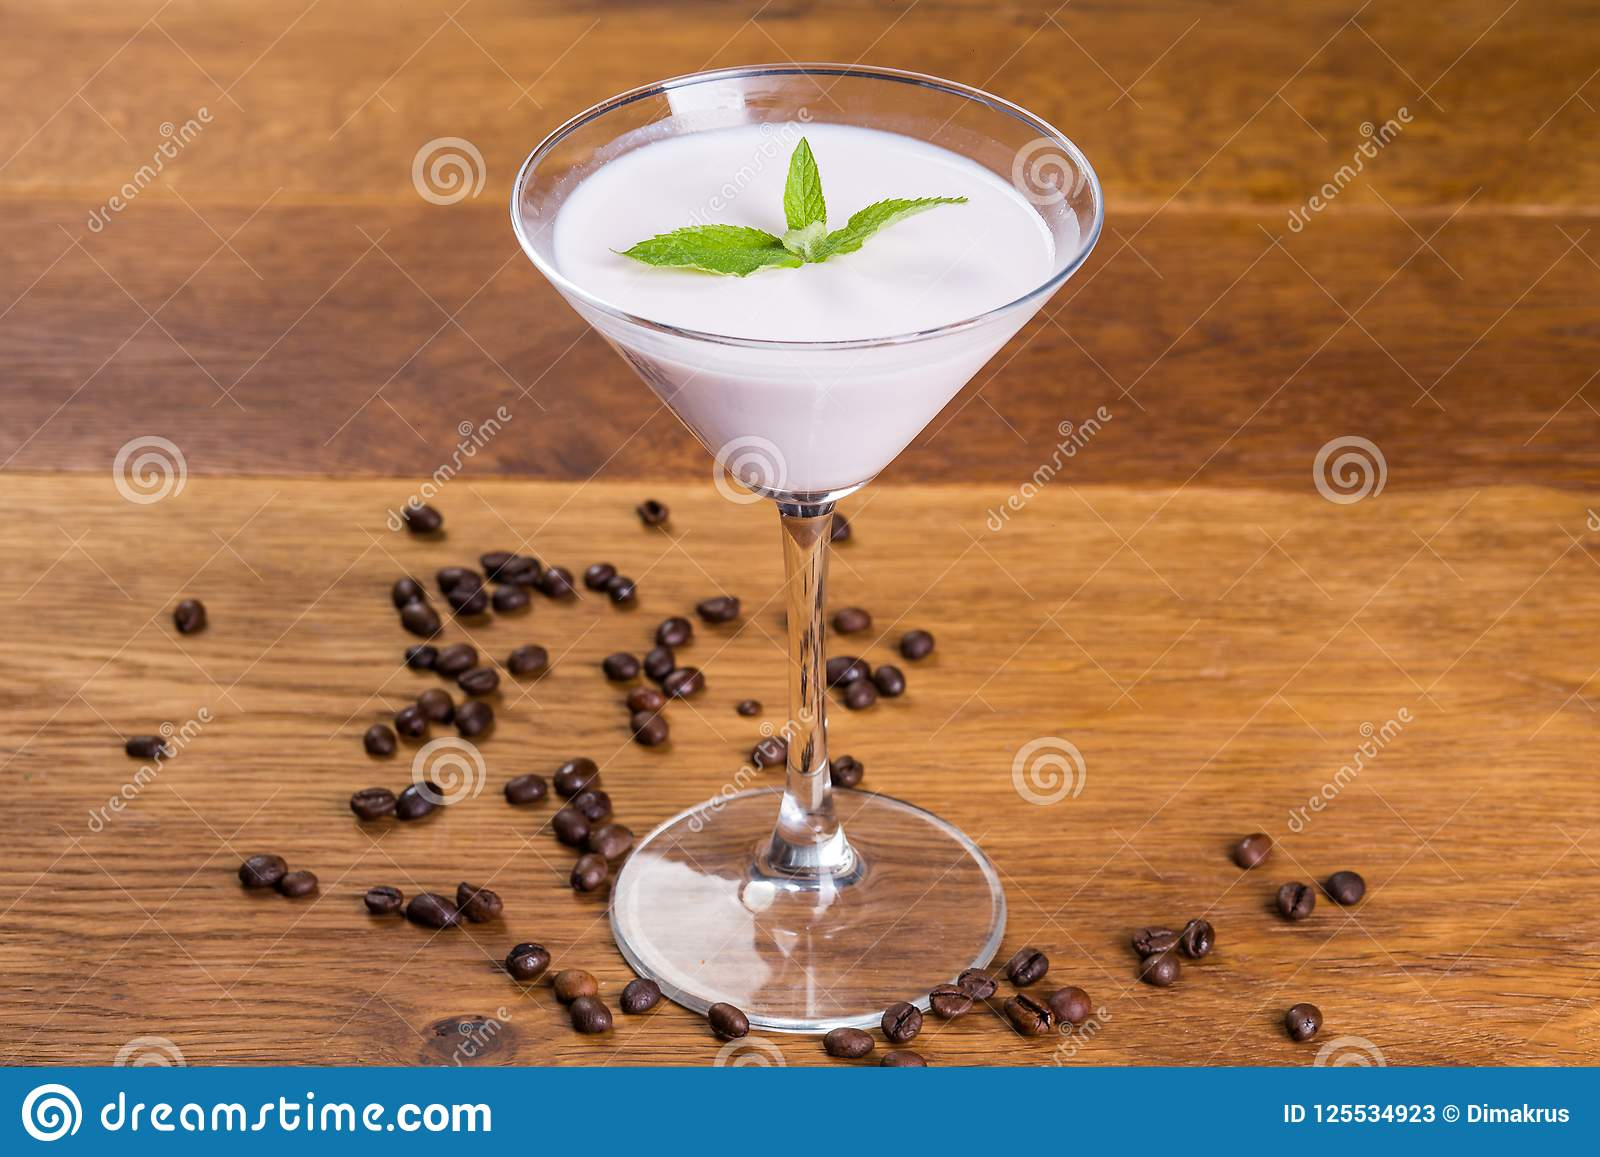 Dessert Melkpudding met vanillearoma en munt lentik